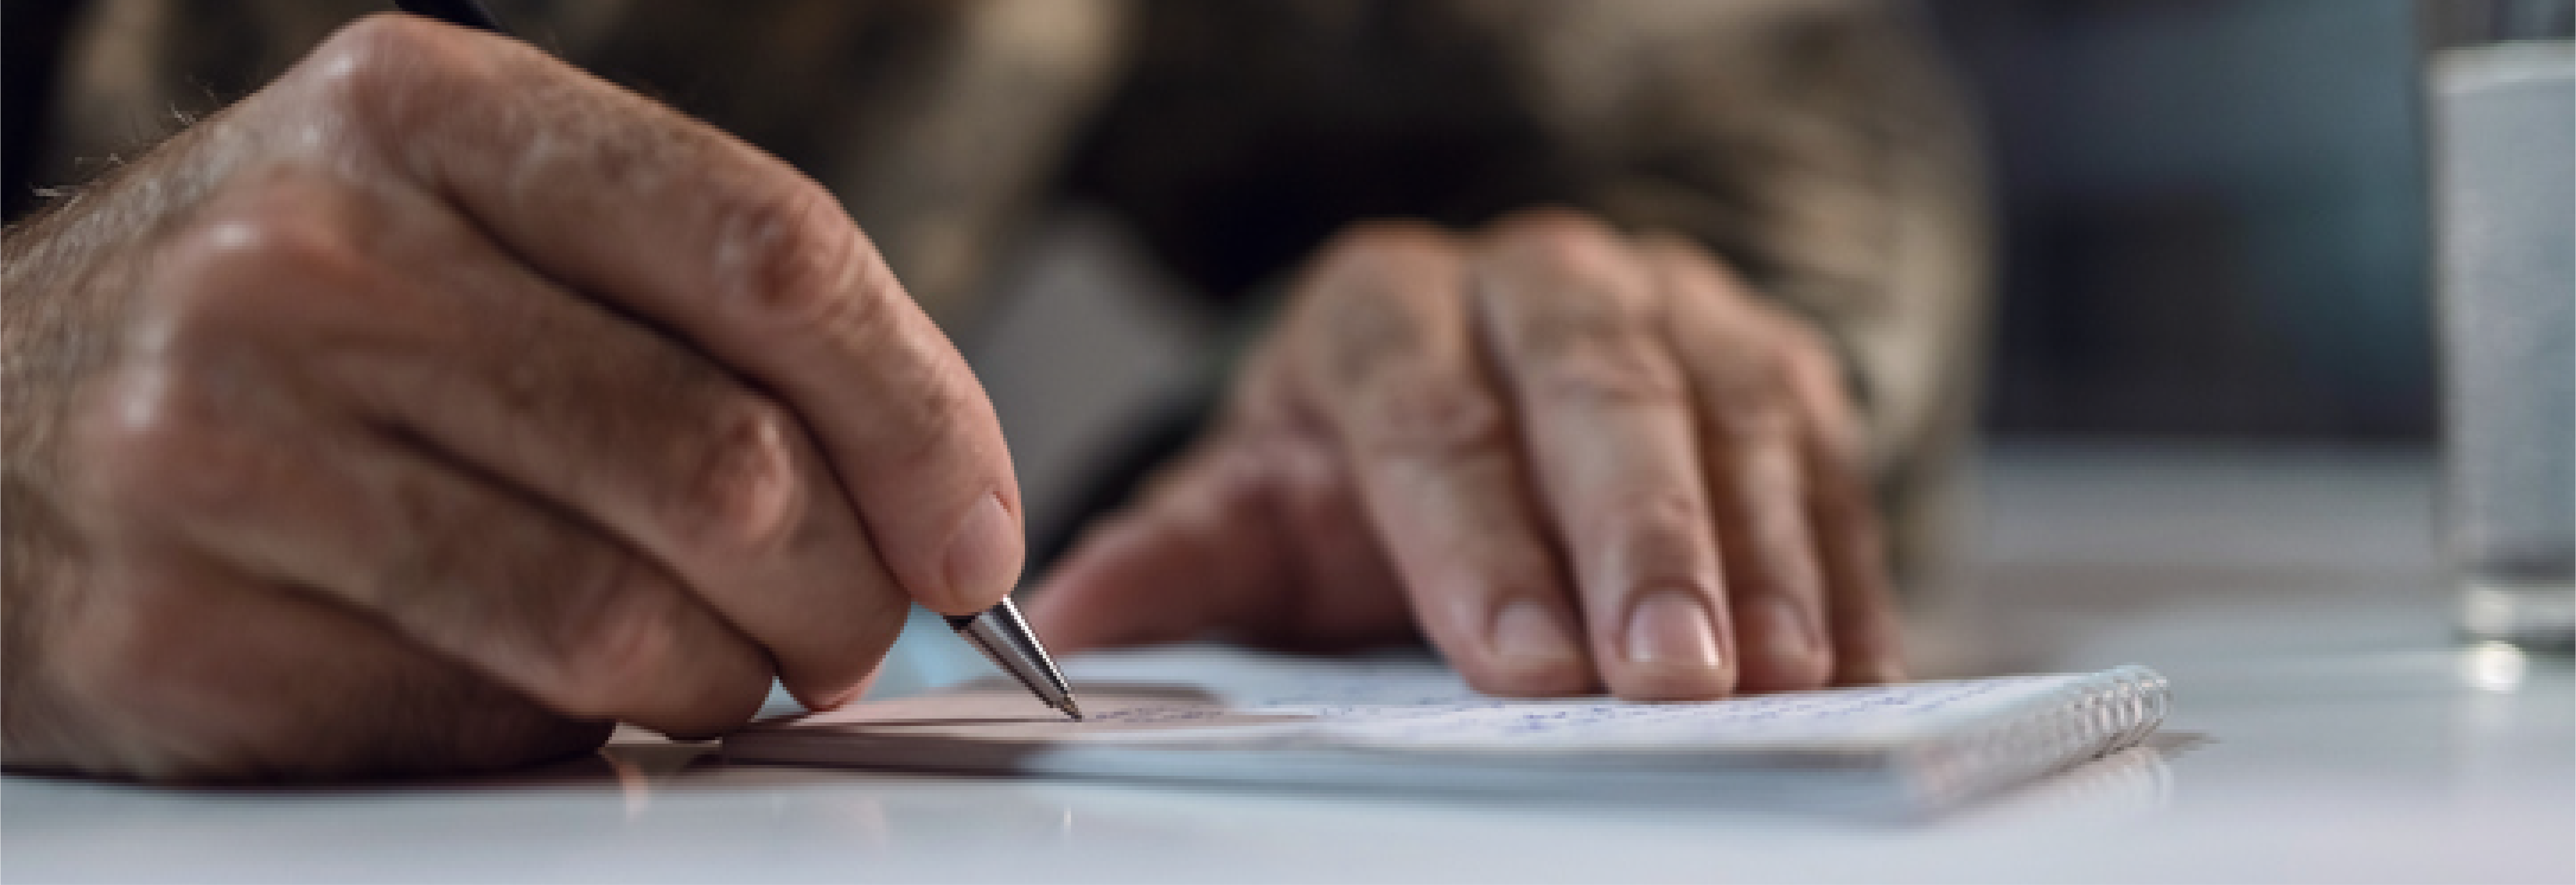 Hirepurpose - helping veteran and their spouses find careers.